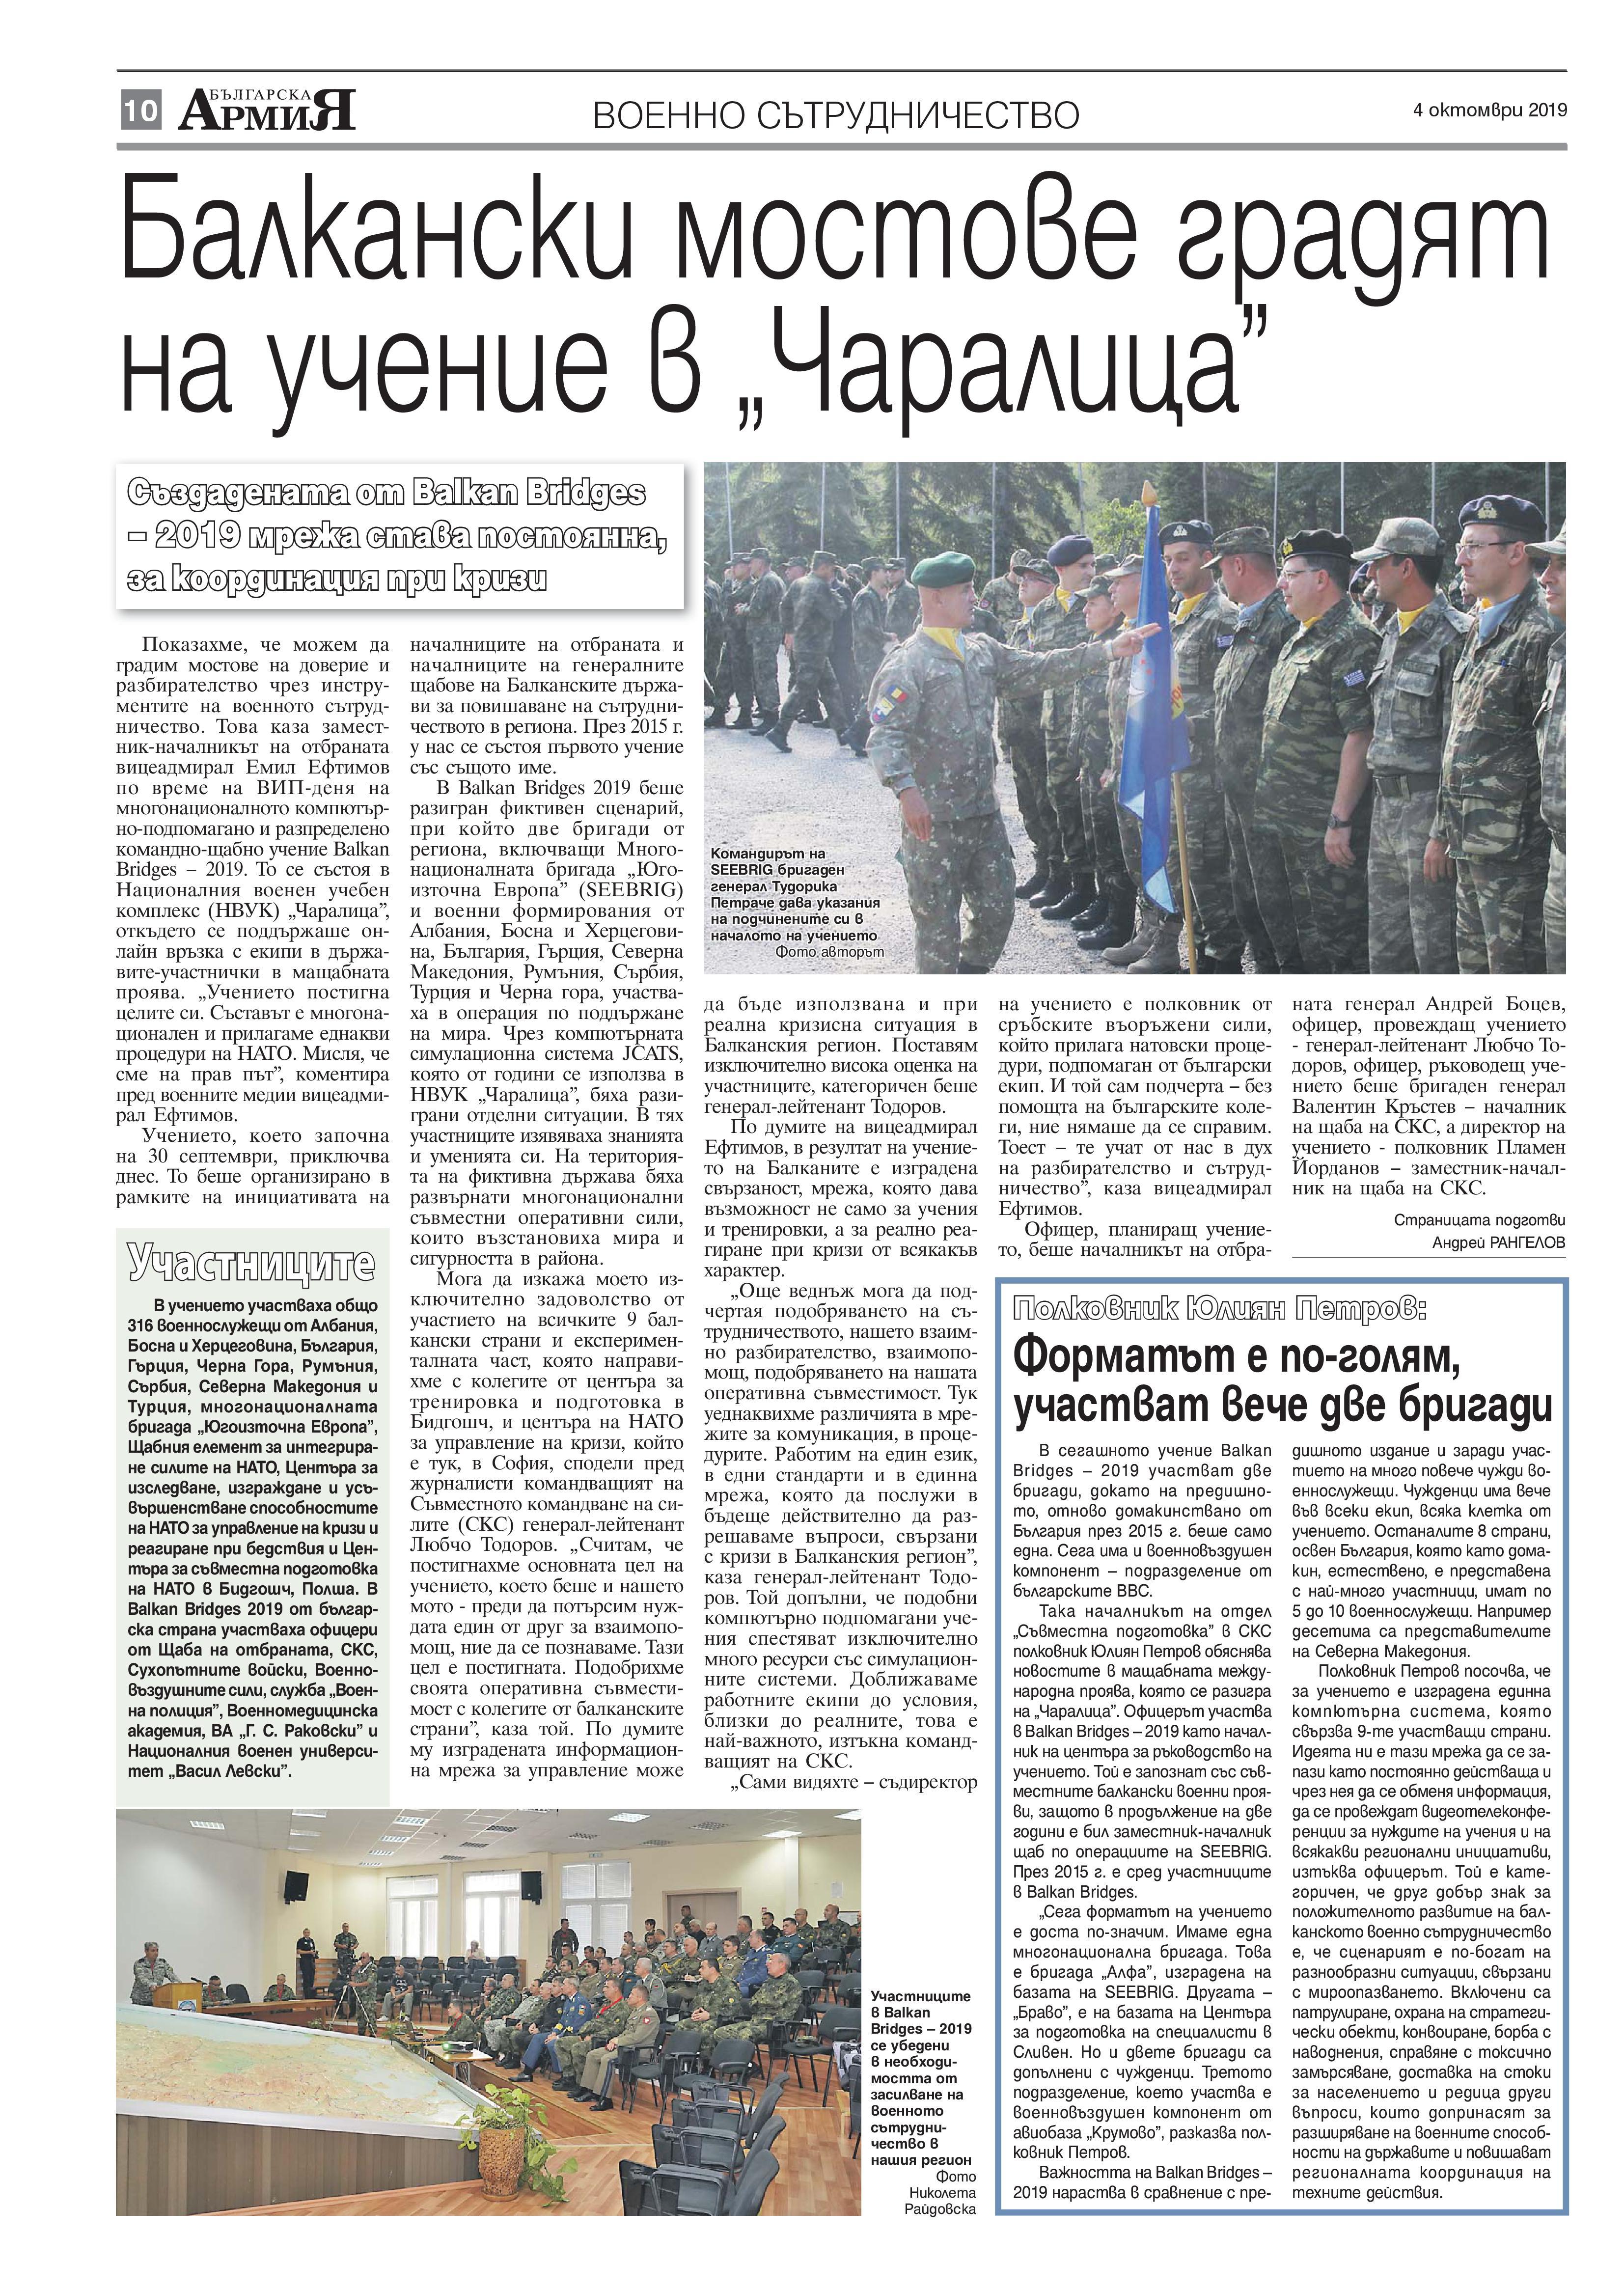 https://armymedia.bg/wp-content/uploads/2015/06/10-33.jpg